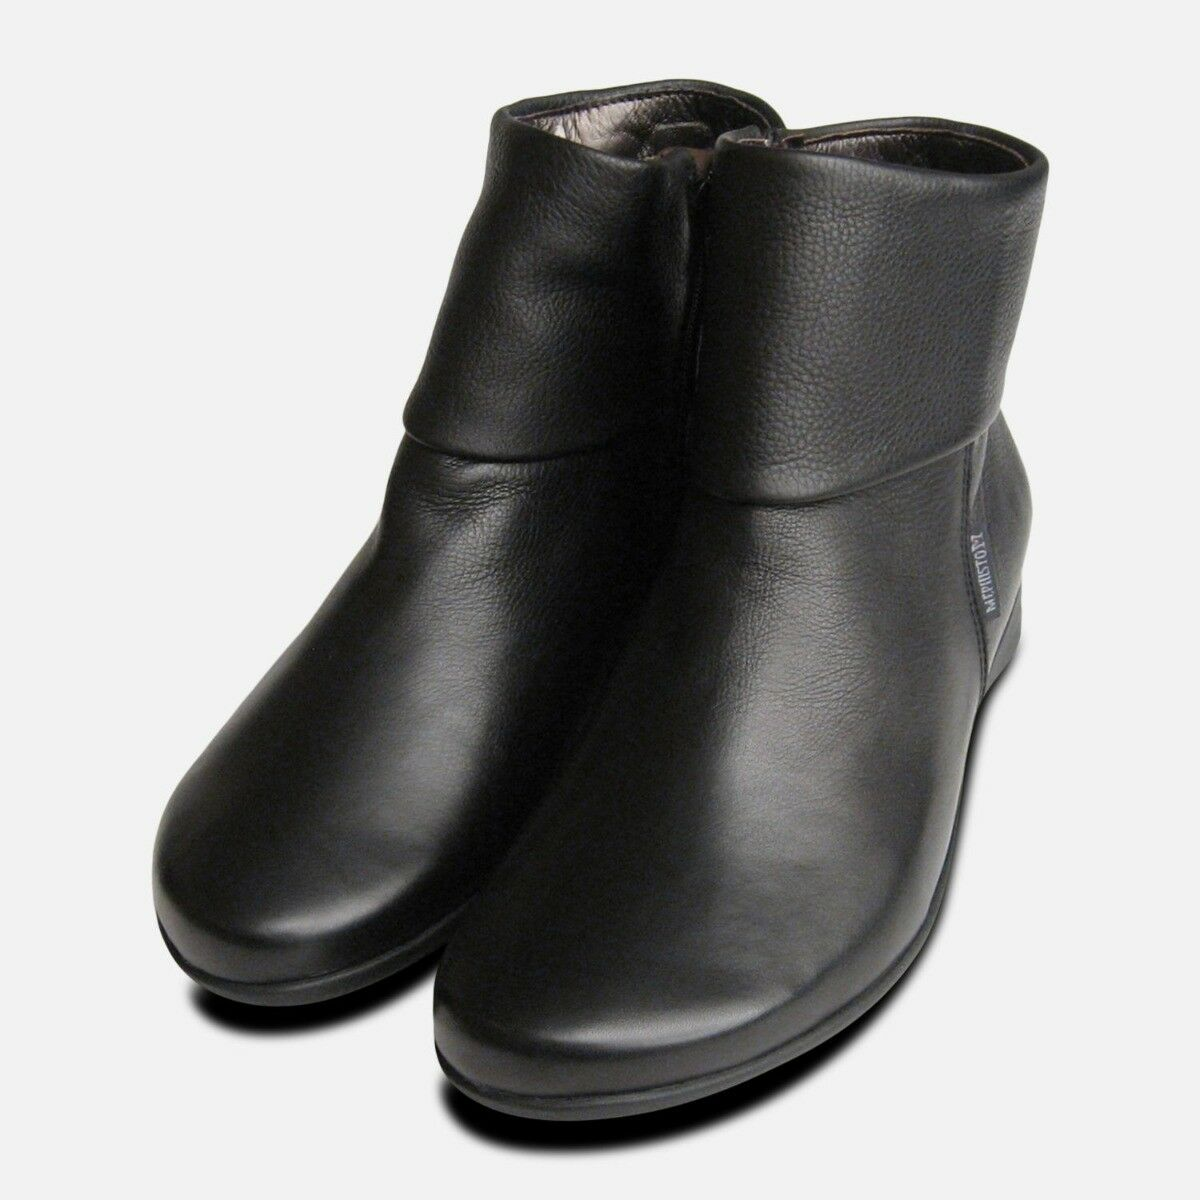 Mephisto Ladies Ladies Ladies Fiducia Black Leather Zip Boots 10542f